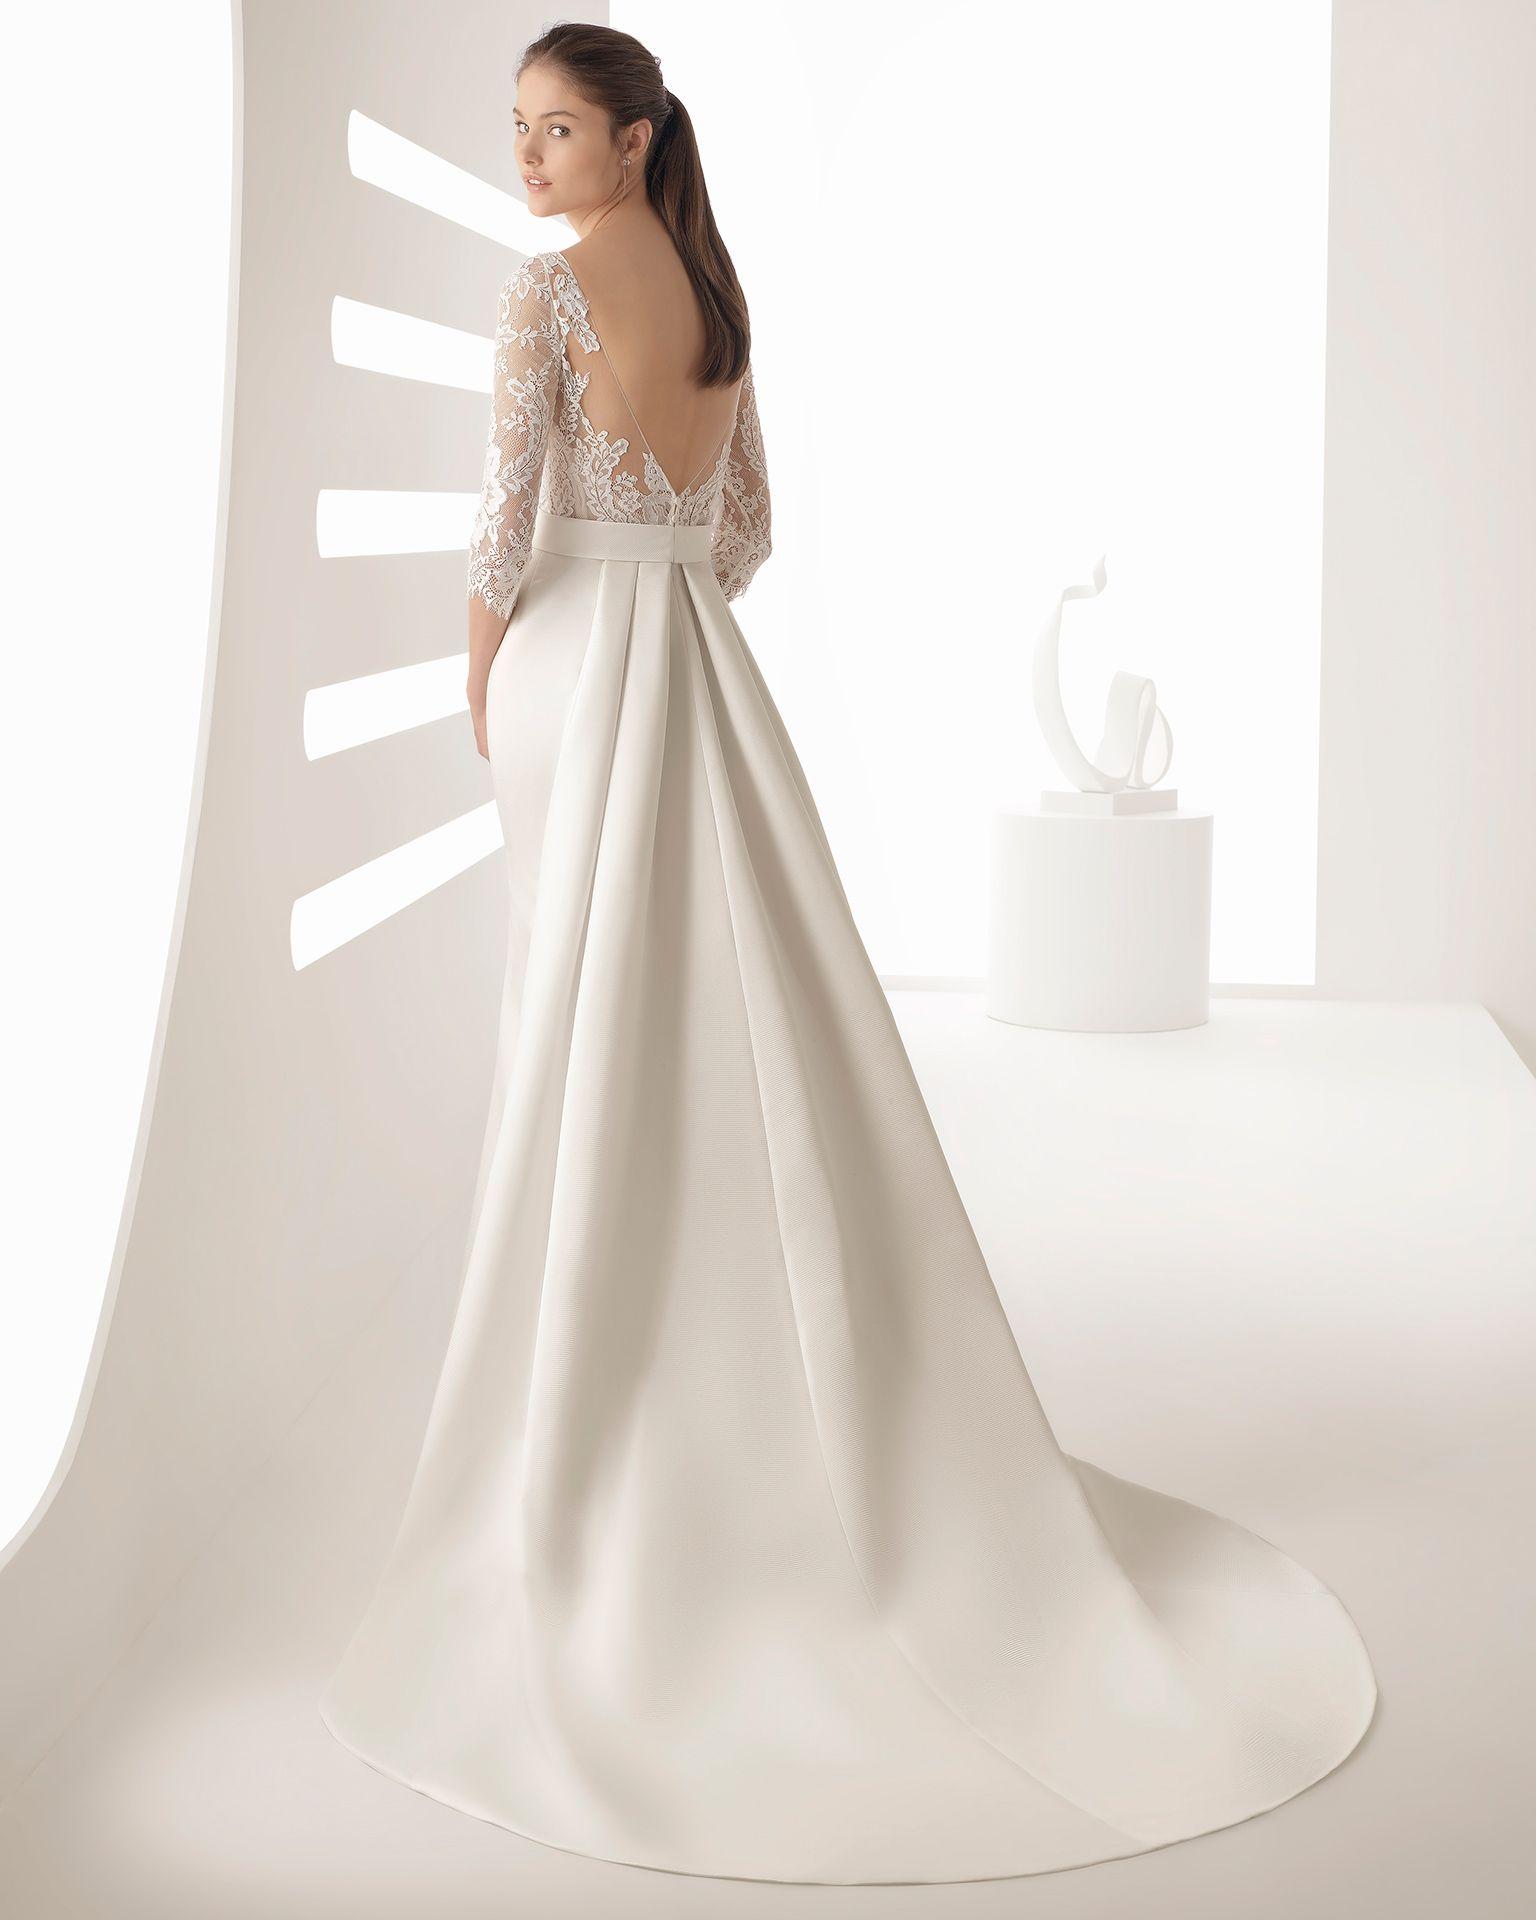 35++ Rosa clara wedding dresses ideas info